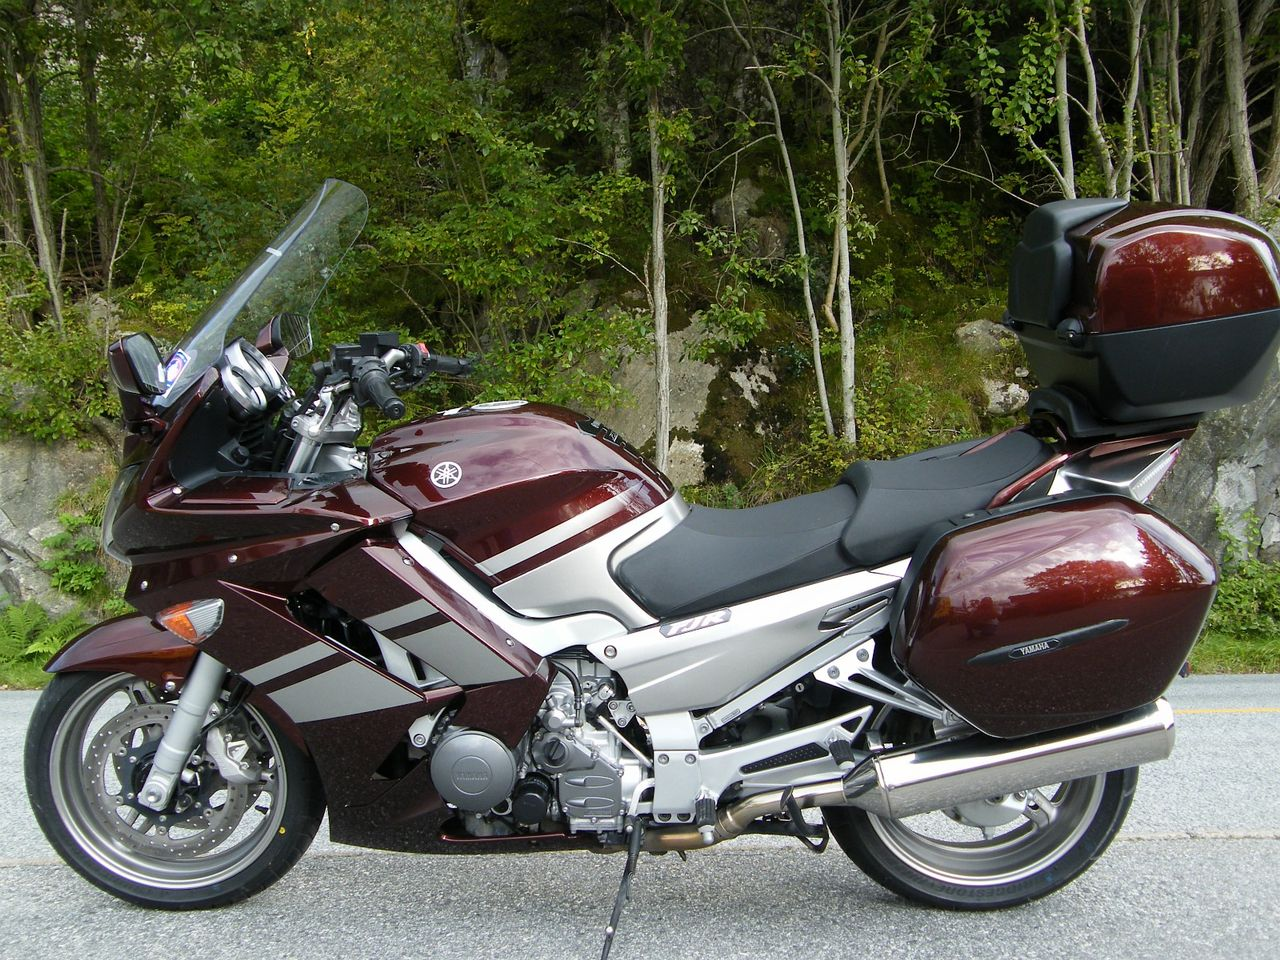 vente achat yamaha fjr 1300 d 39 occasion epinal 88 moto scooter marseille occasion moto. Black Bedroom Furniture Sets. Home Design Ideas